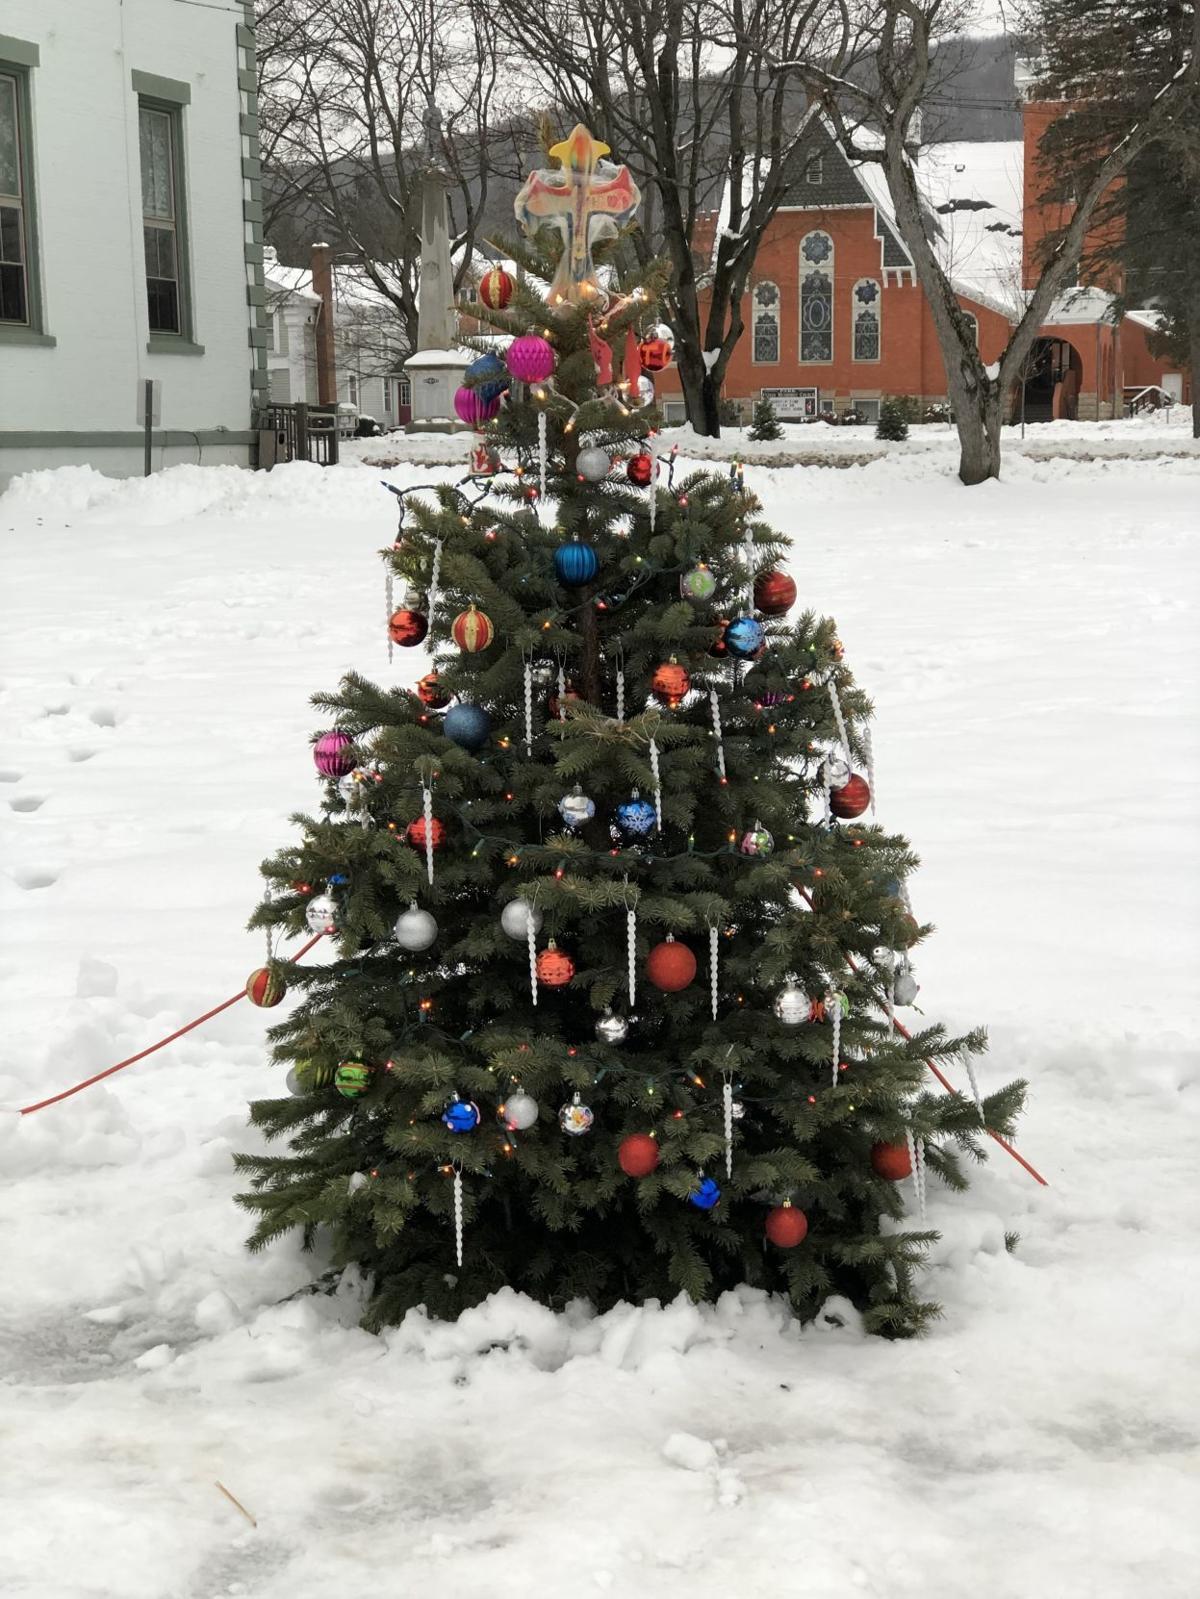 Groovy O Christmas Tree Potter Leader Enterprise Download Free Architecture Designs Rallybritishbridgeorg